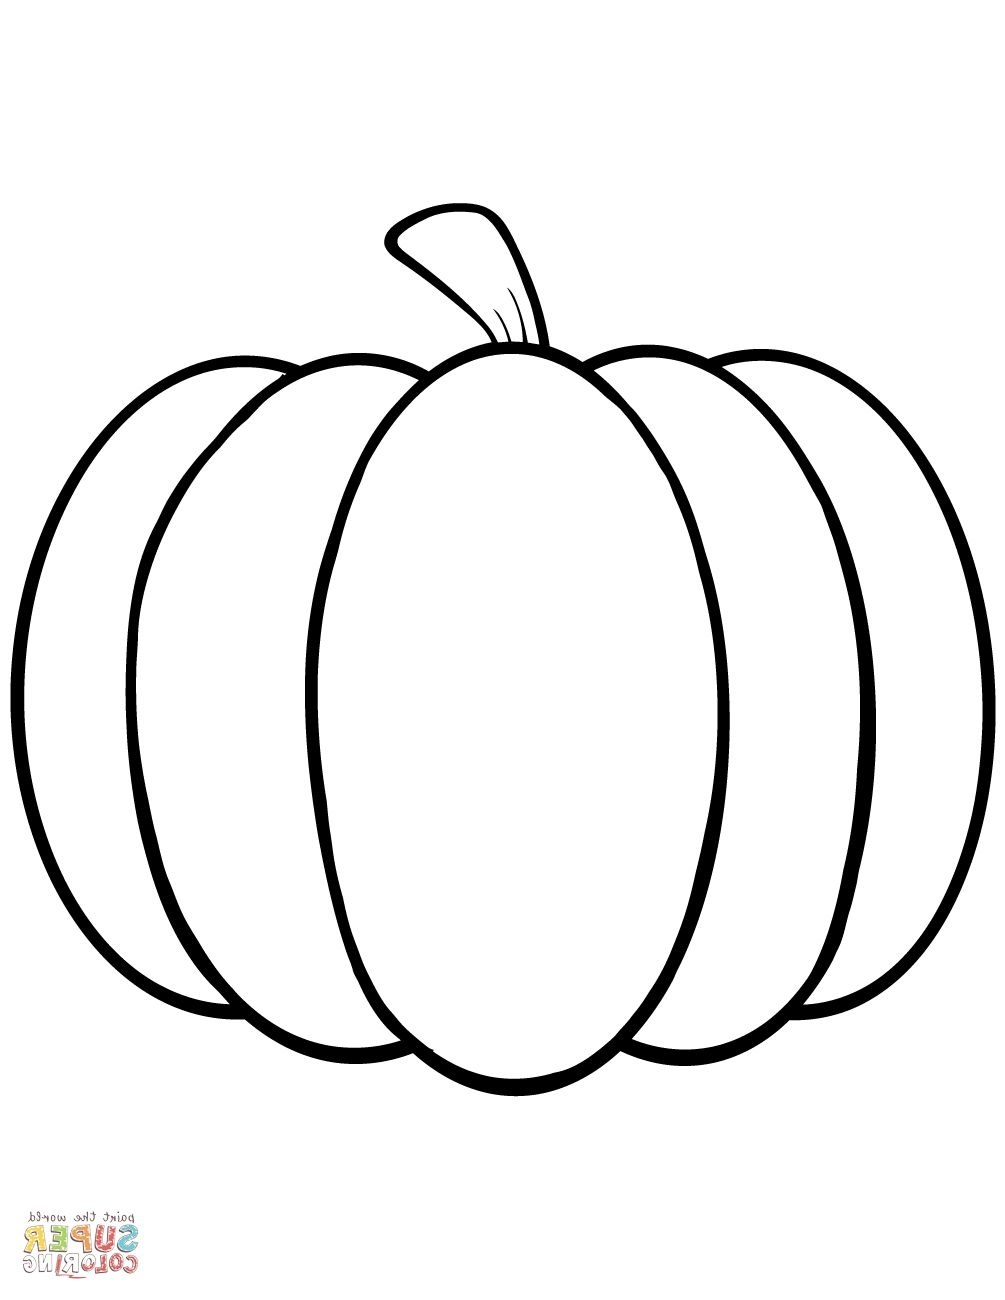 Pumpkin Coloring Sheet   Coloring Page   Pumpkin Coloring Pages - Free Printable Pumpkin Coloring Pages